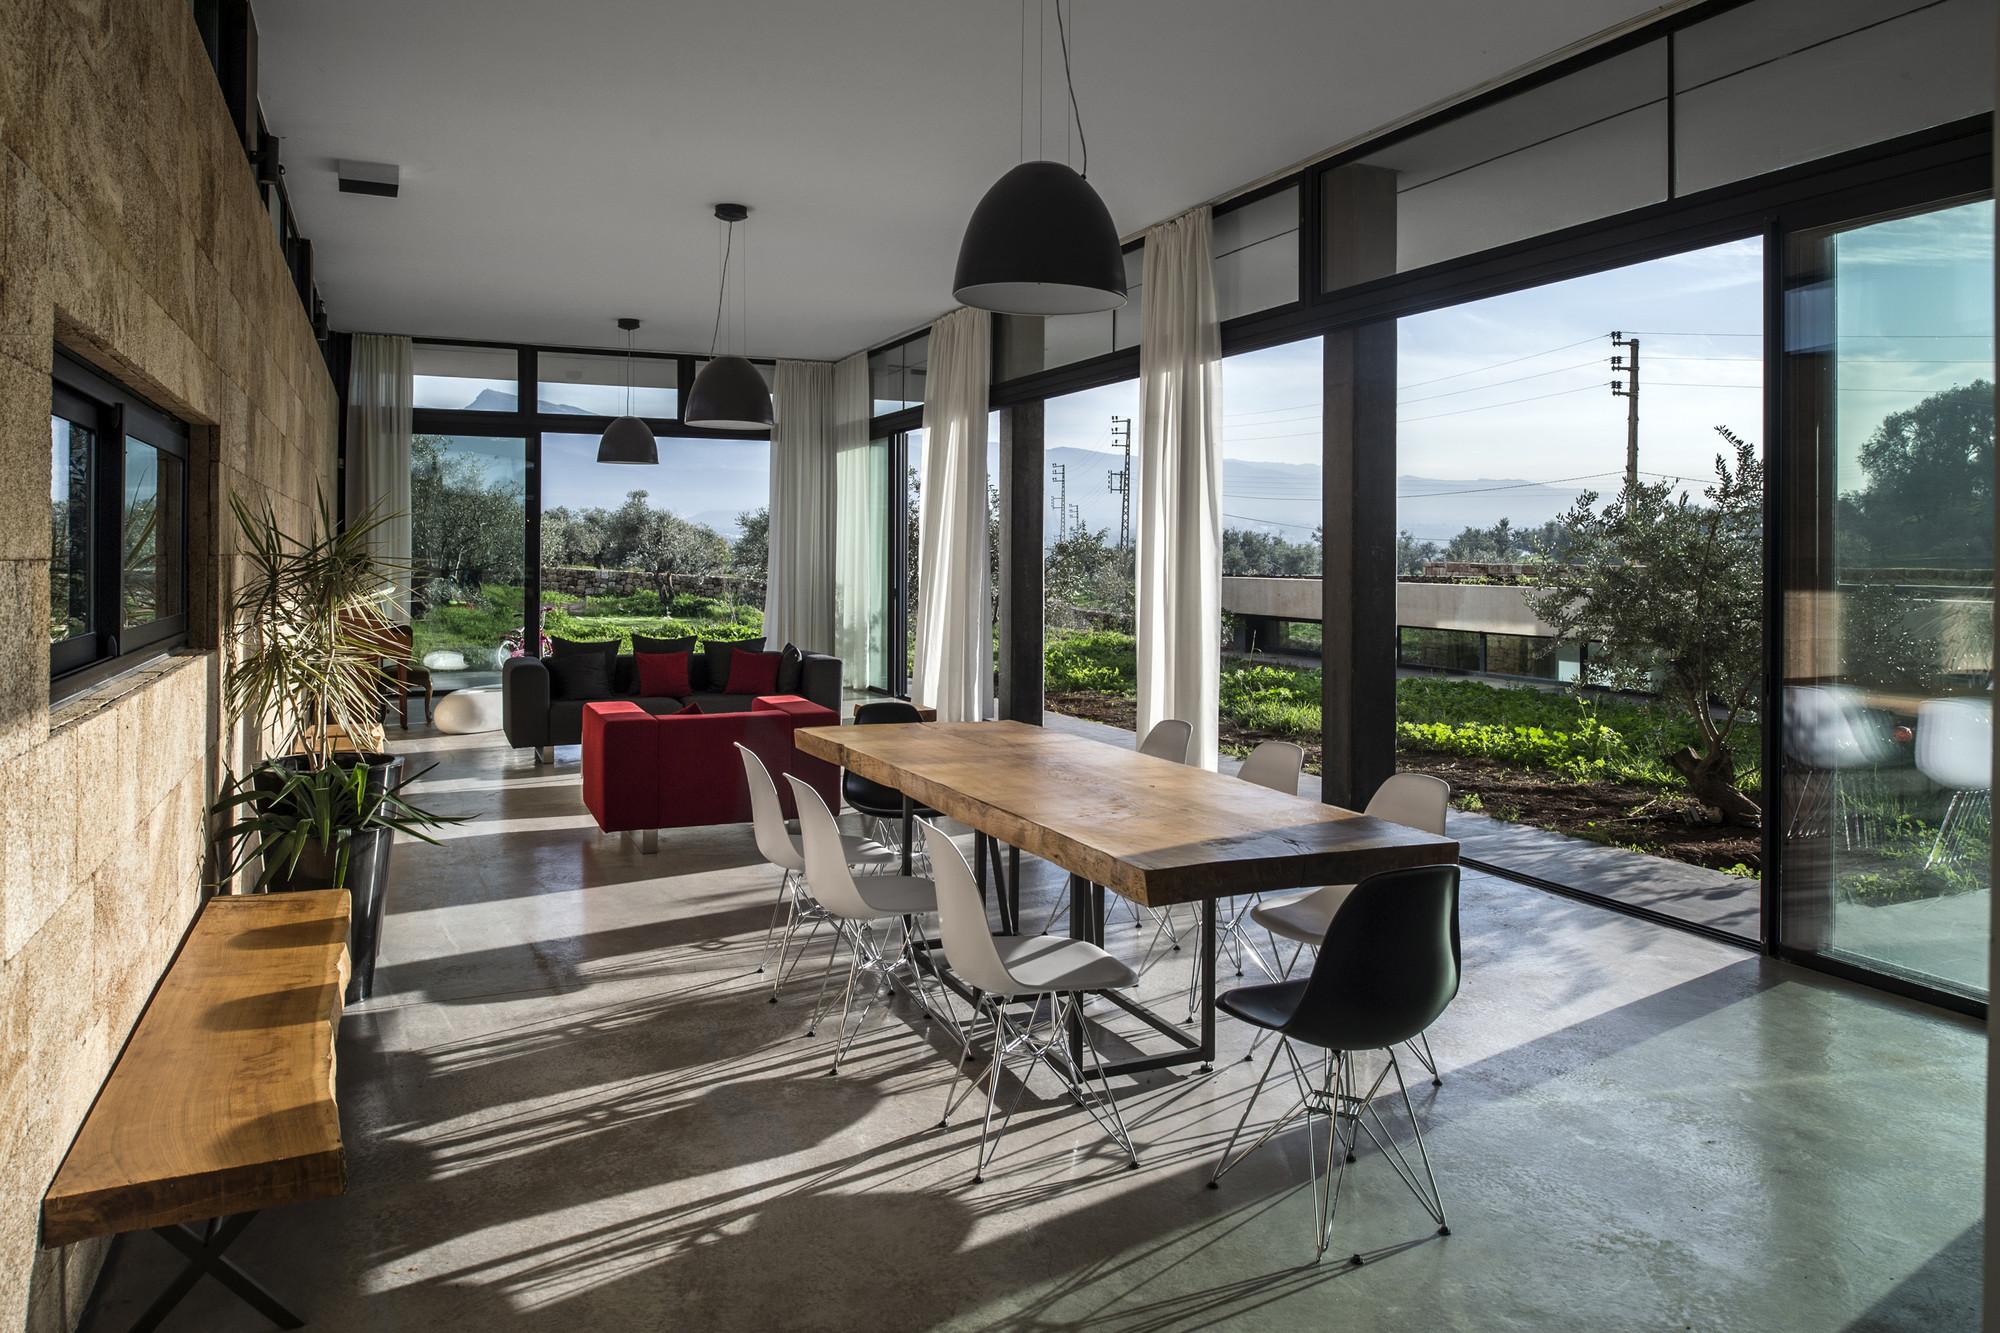 Mediterranean Style House Plans Gallery Of Zgharta House Platau 2